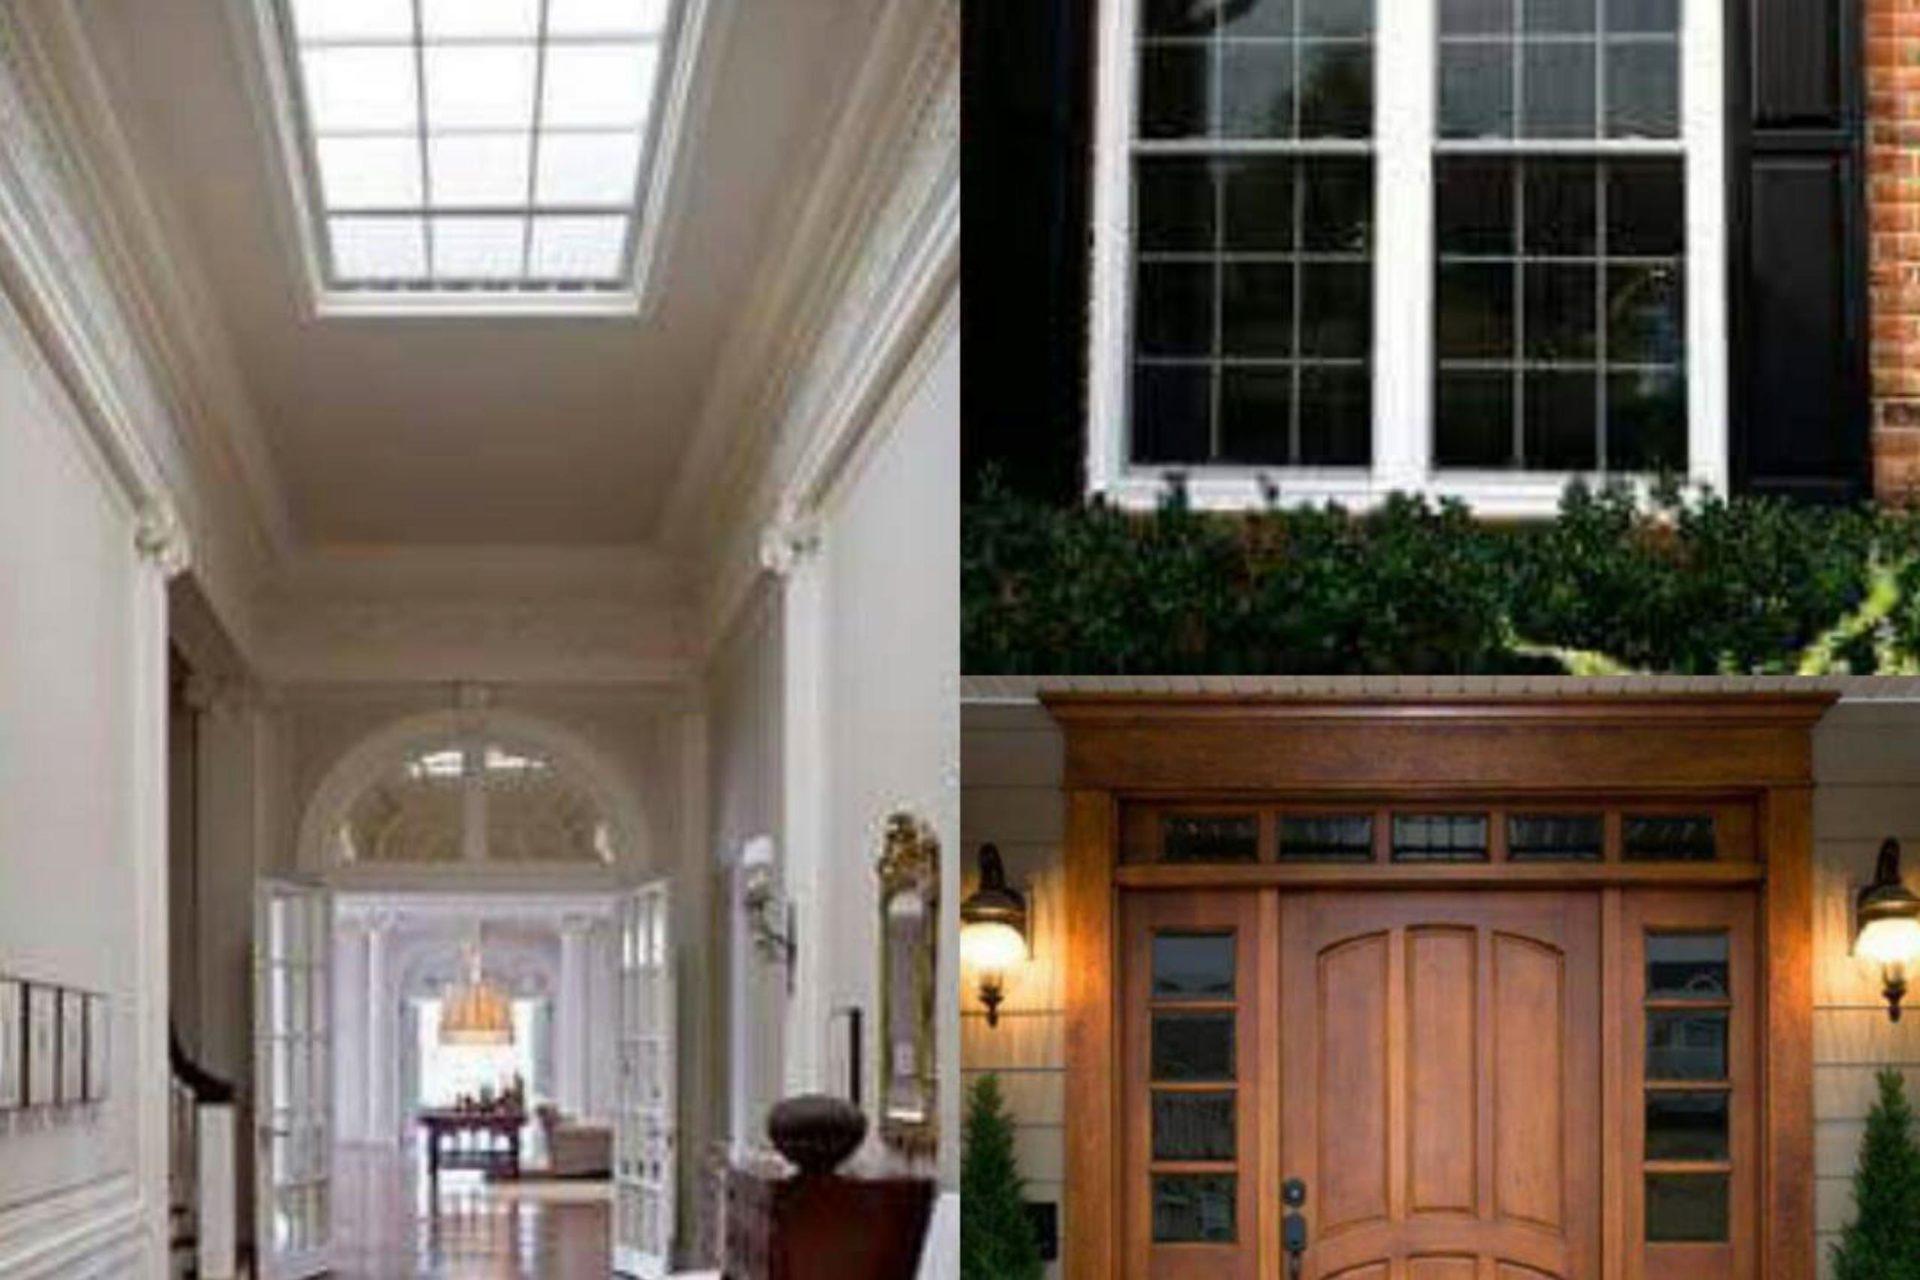 Energy Savers Windows Doors Skylights & Energy Savers: Windows Doors Skylights - Nexus Energy Center